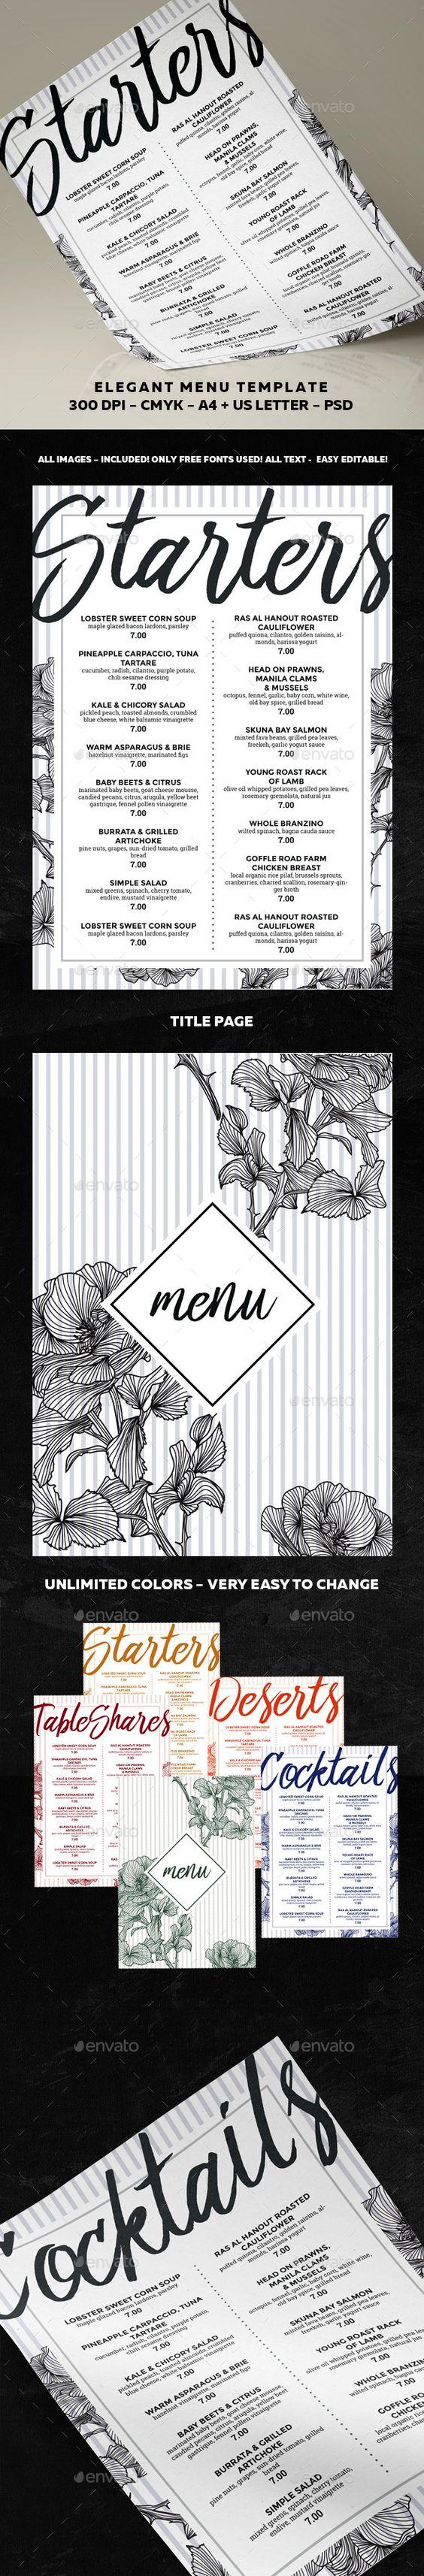 Food Menu Template PSD. Download here: http://graphicriver.net/item/menu-template/16666727?ref=ksioks